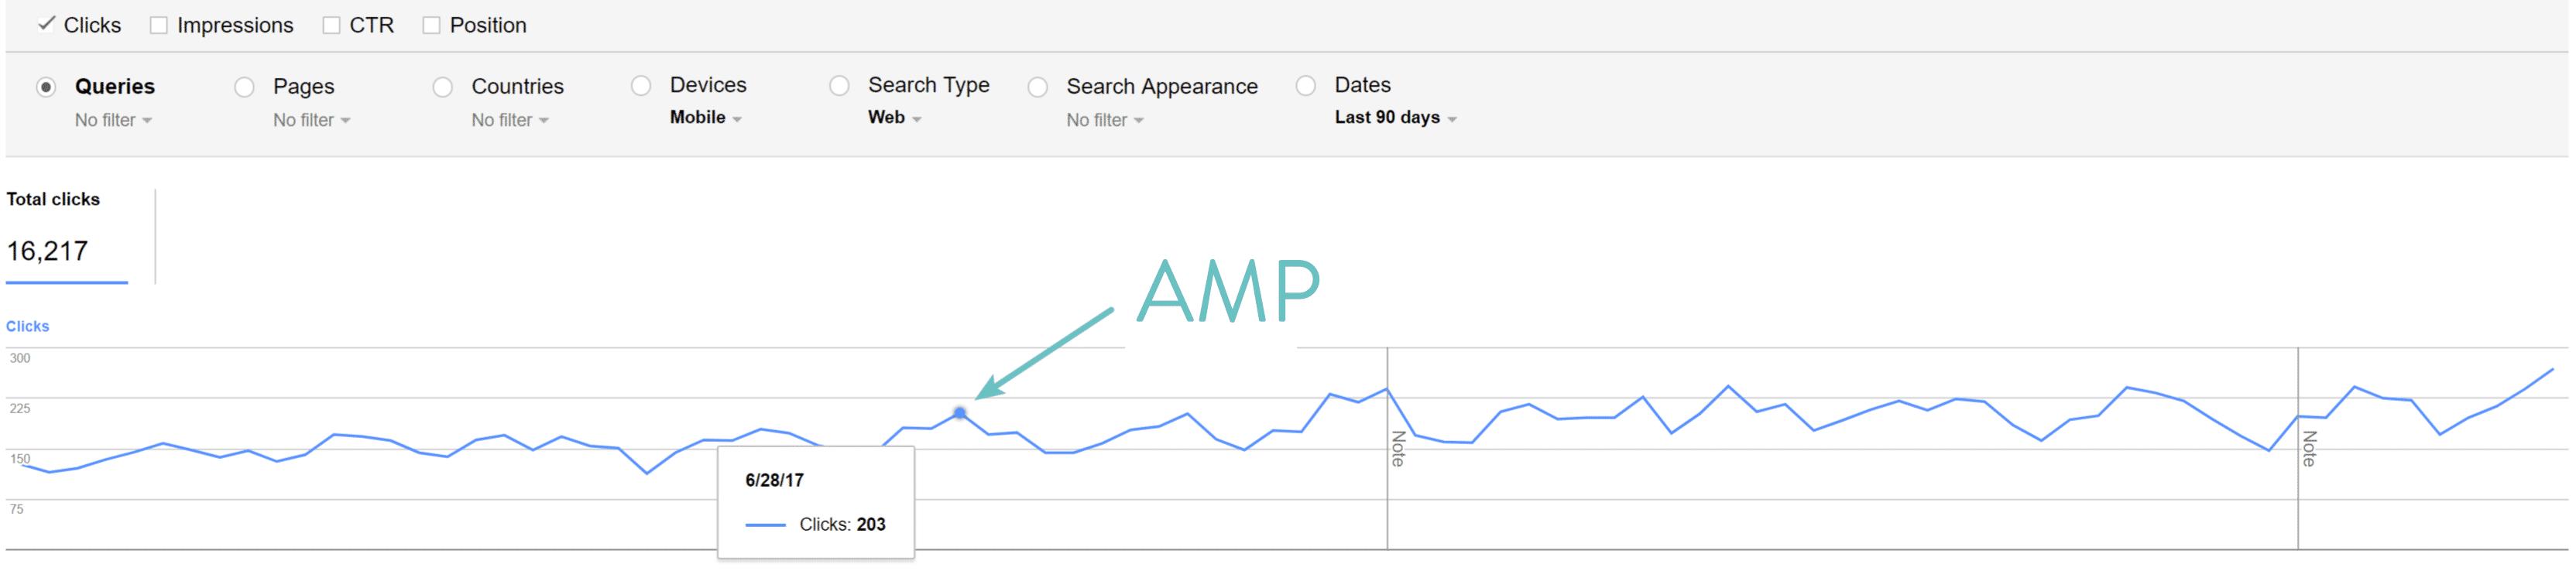 Google AMPのクリック数